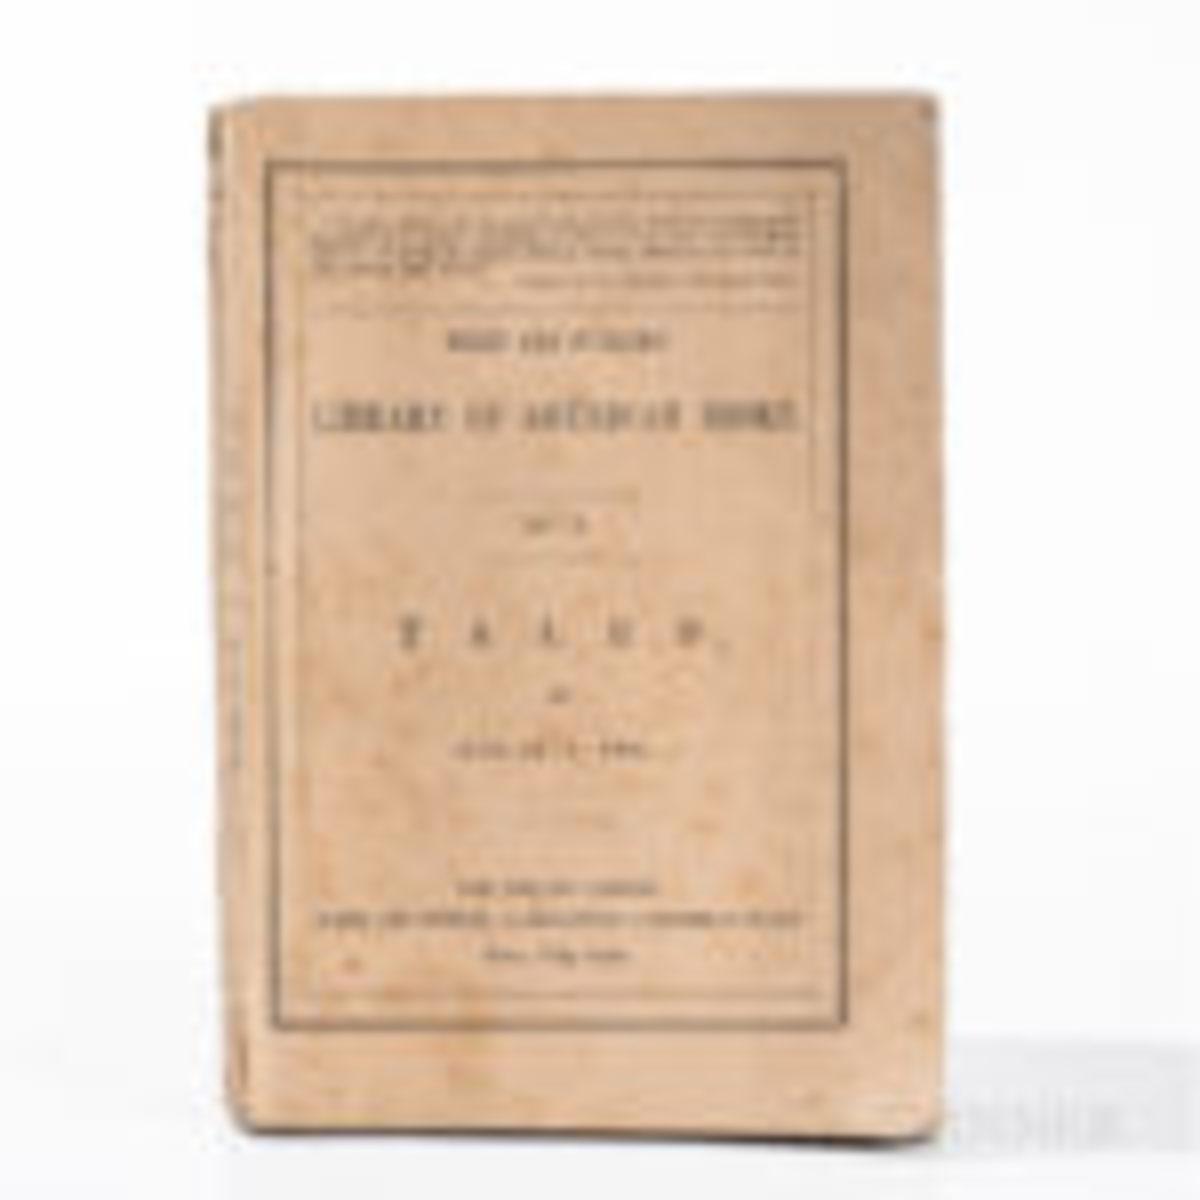 Poe, Edgar Allan (1809-1849) Tales, First Edition